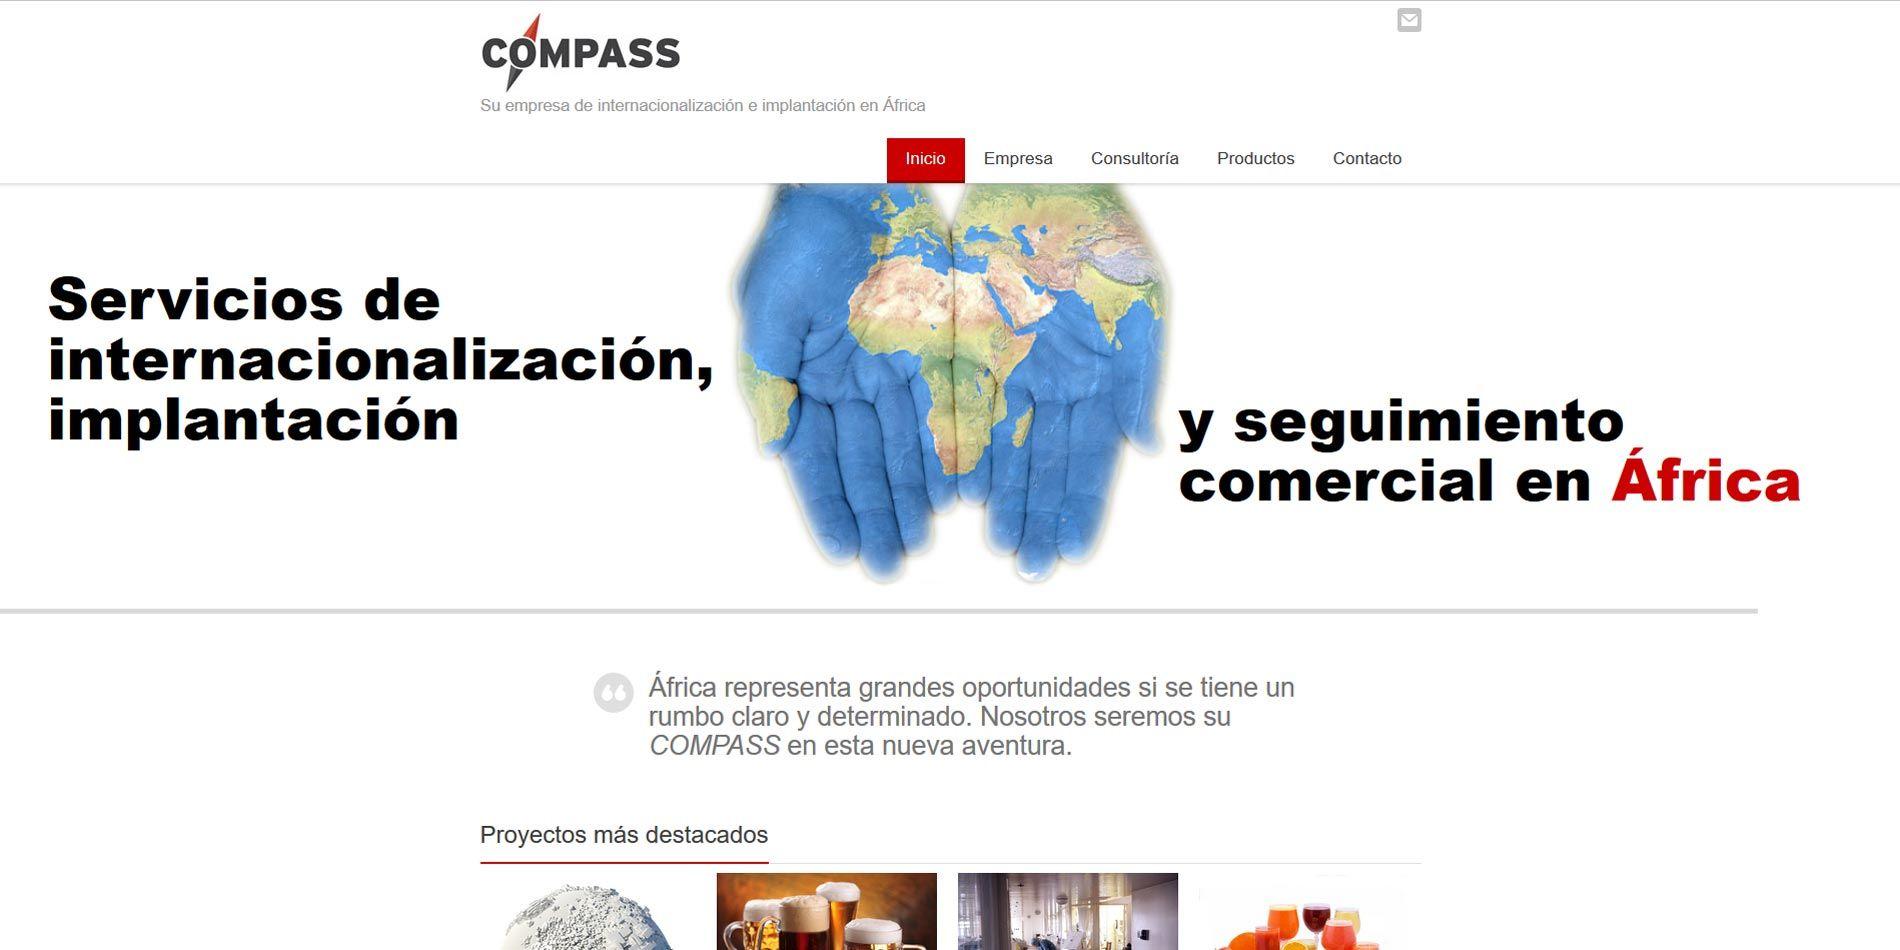 Compassworld